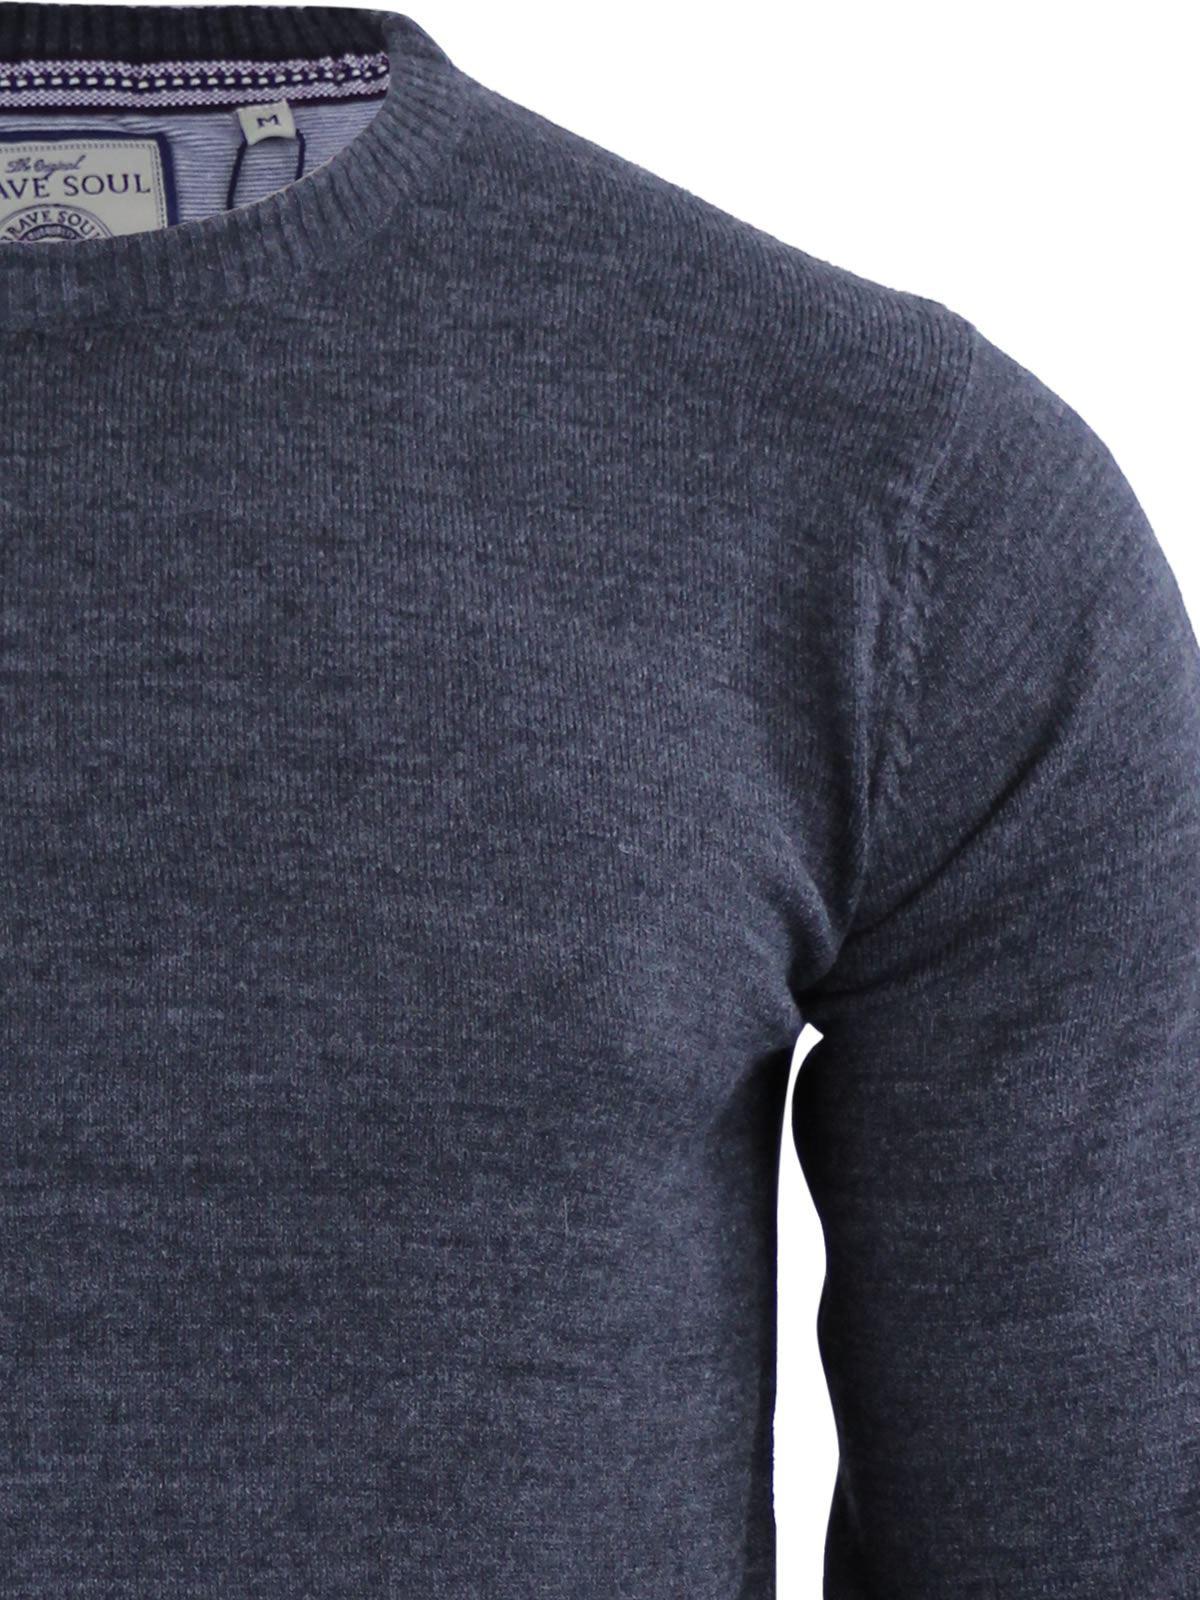 Brave-Soul-Urbain-Mens-Jumper-Knitted-Crew-Neck-Sweater thumbnail 41